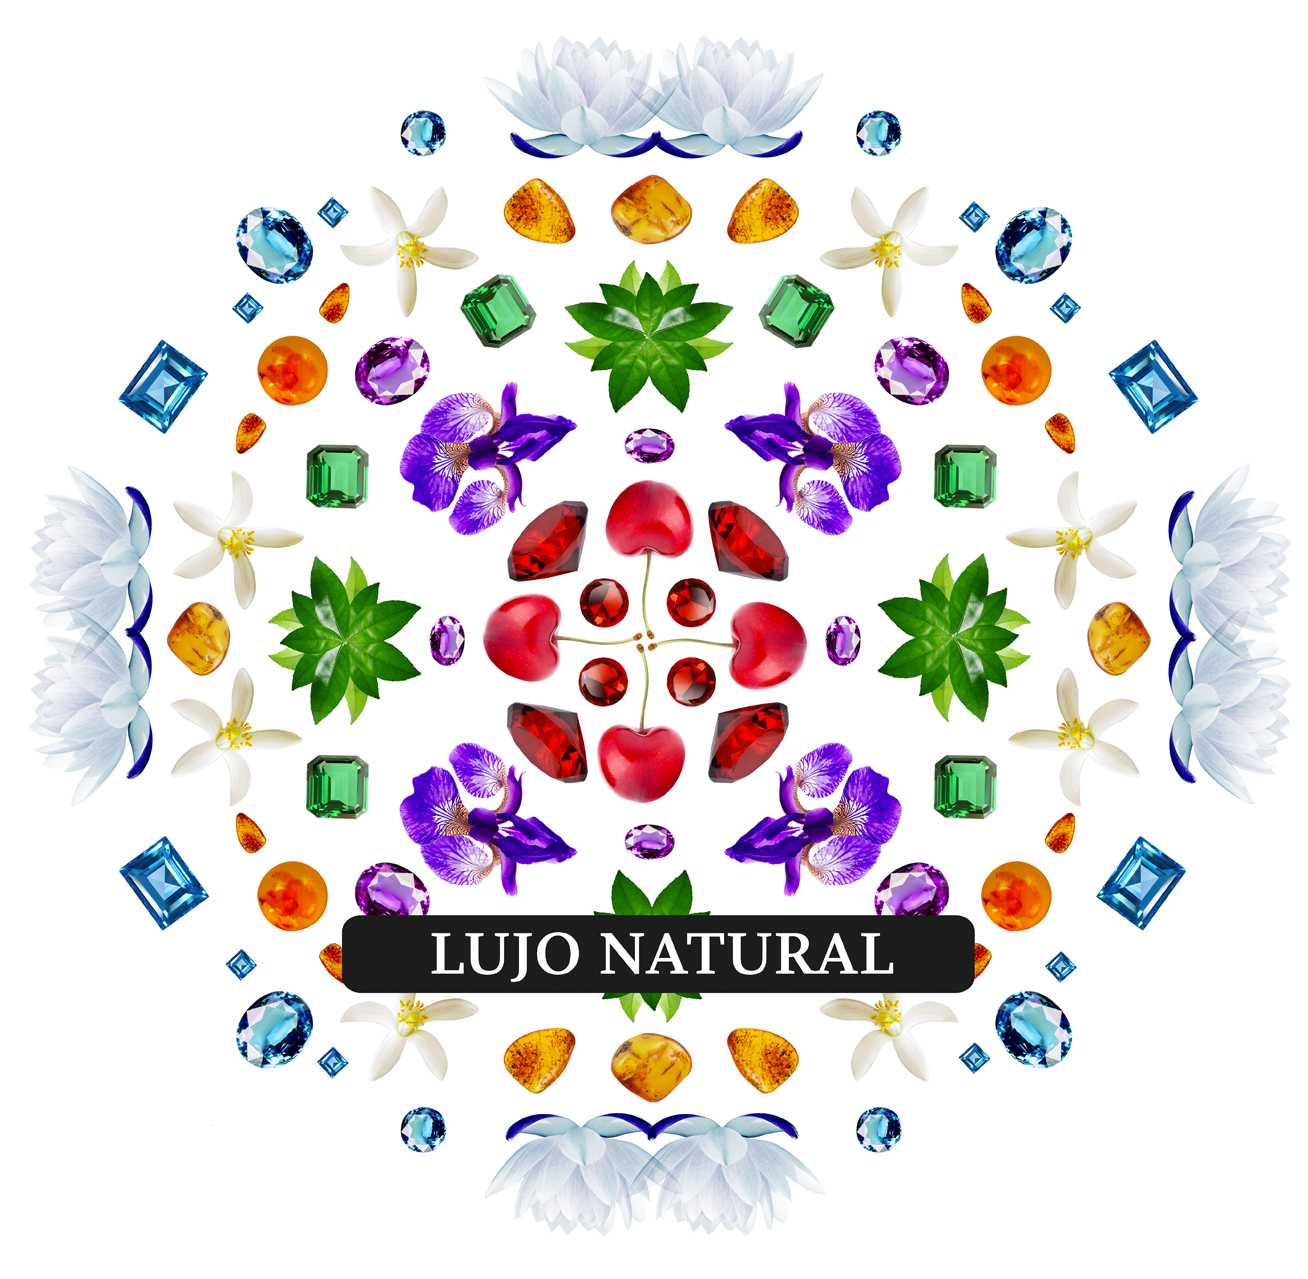 Cremas Lujo Natural